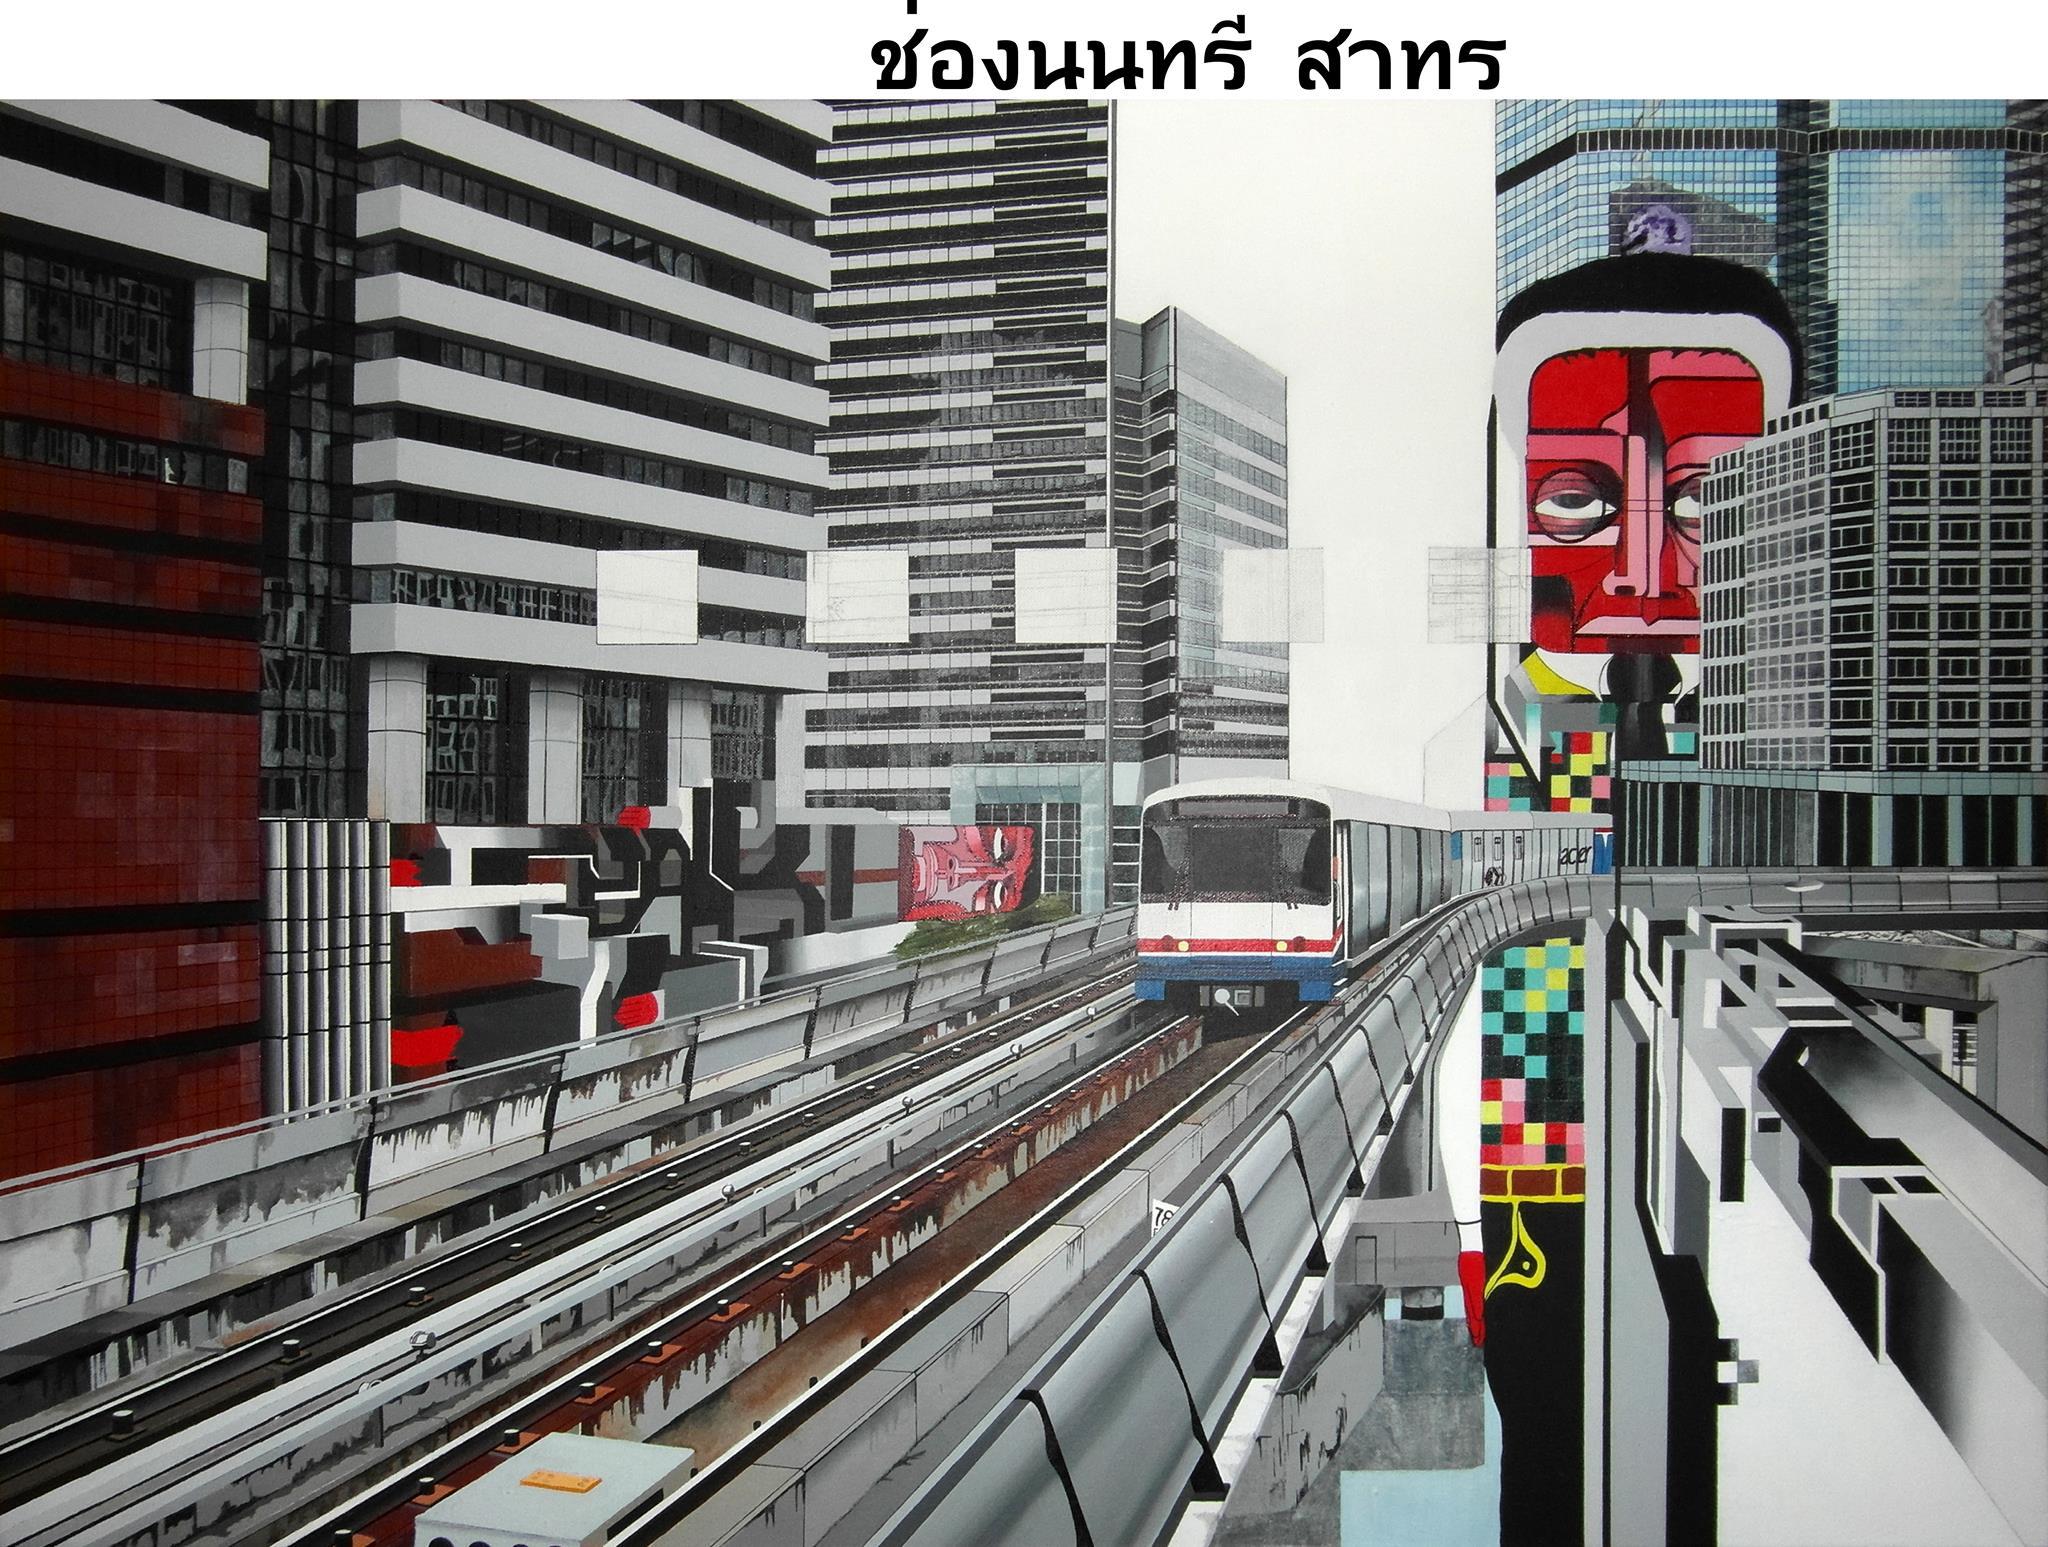 Chong Nonsi Sathon Bangkok.